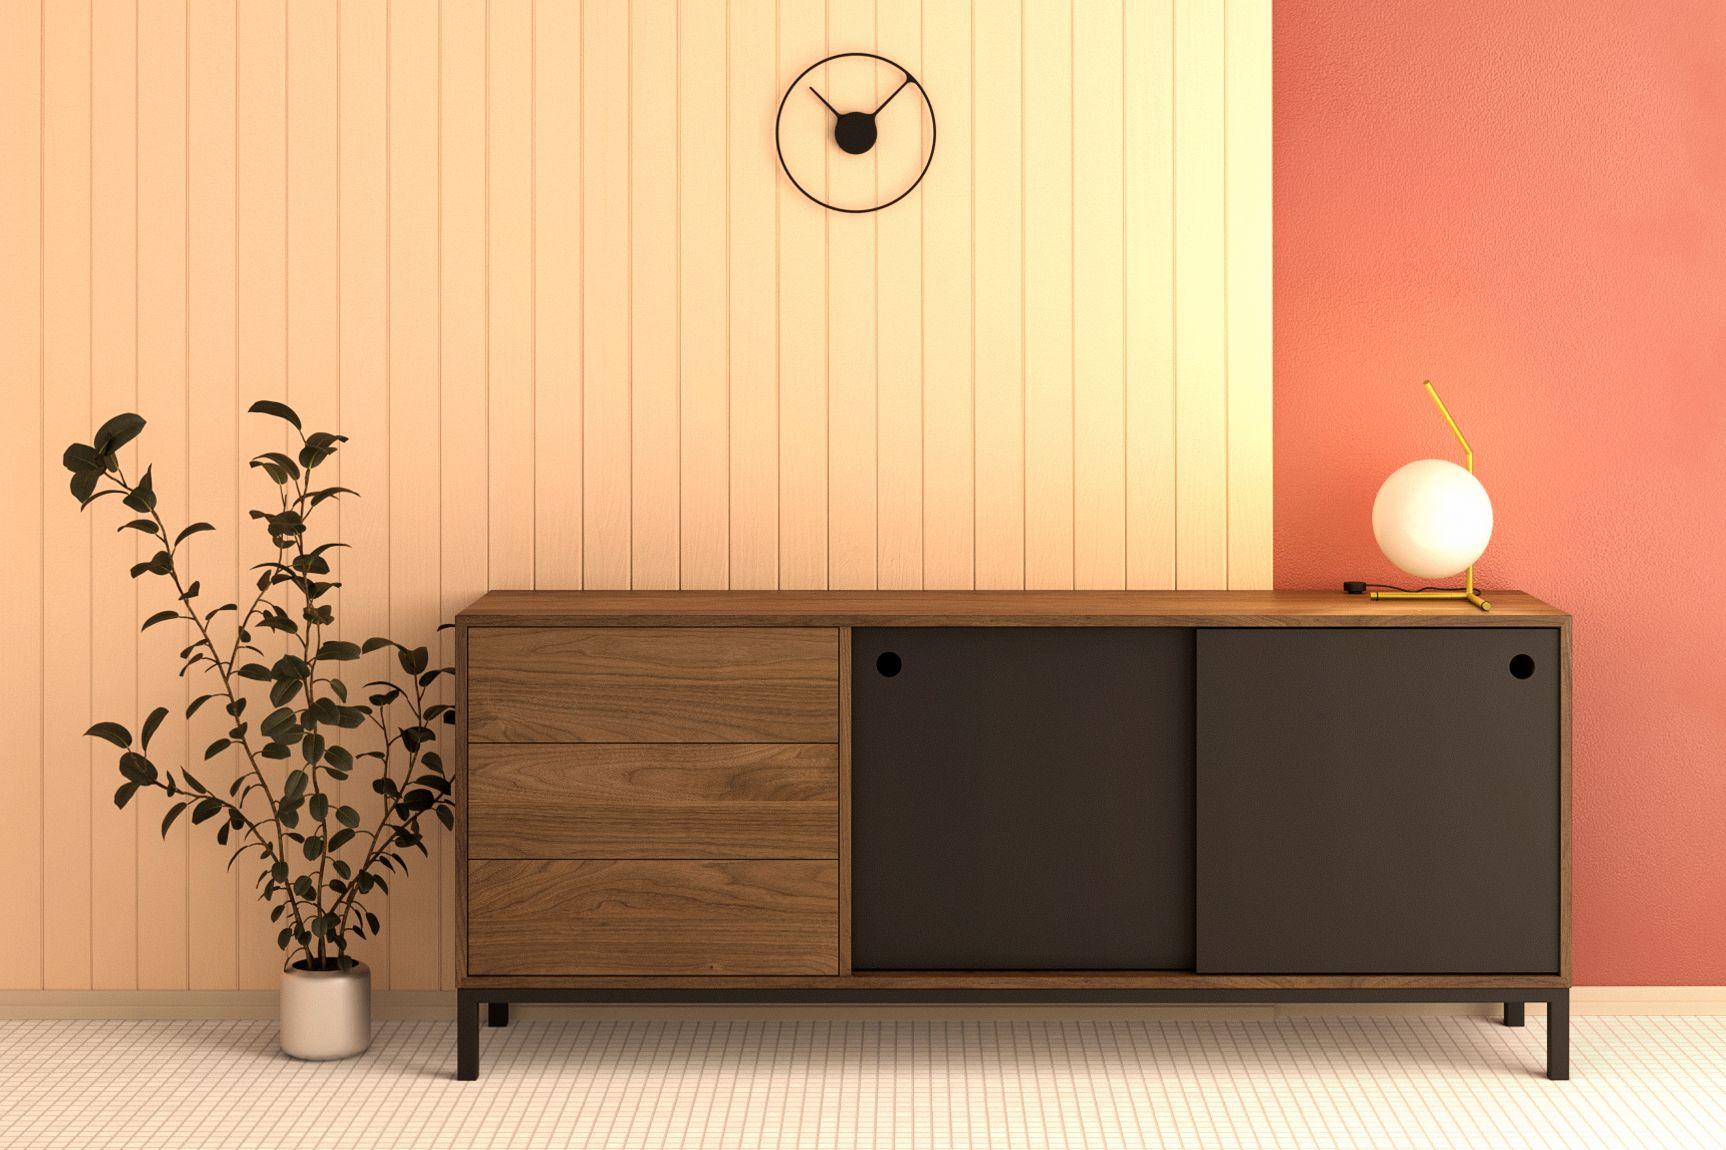 Hume Home Decor Furniture Decor